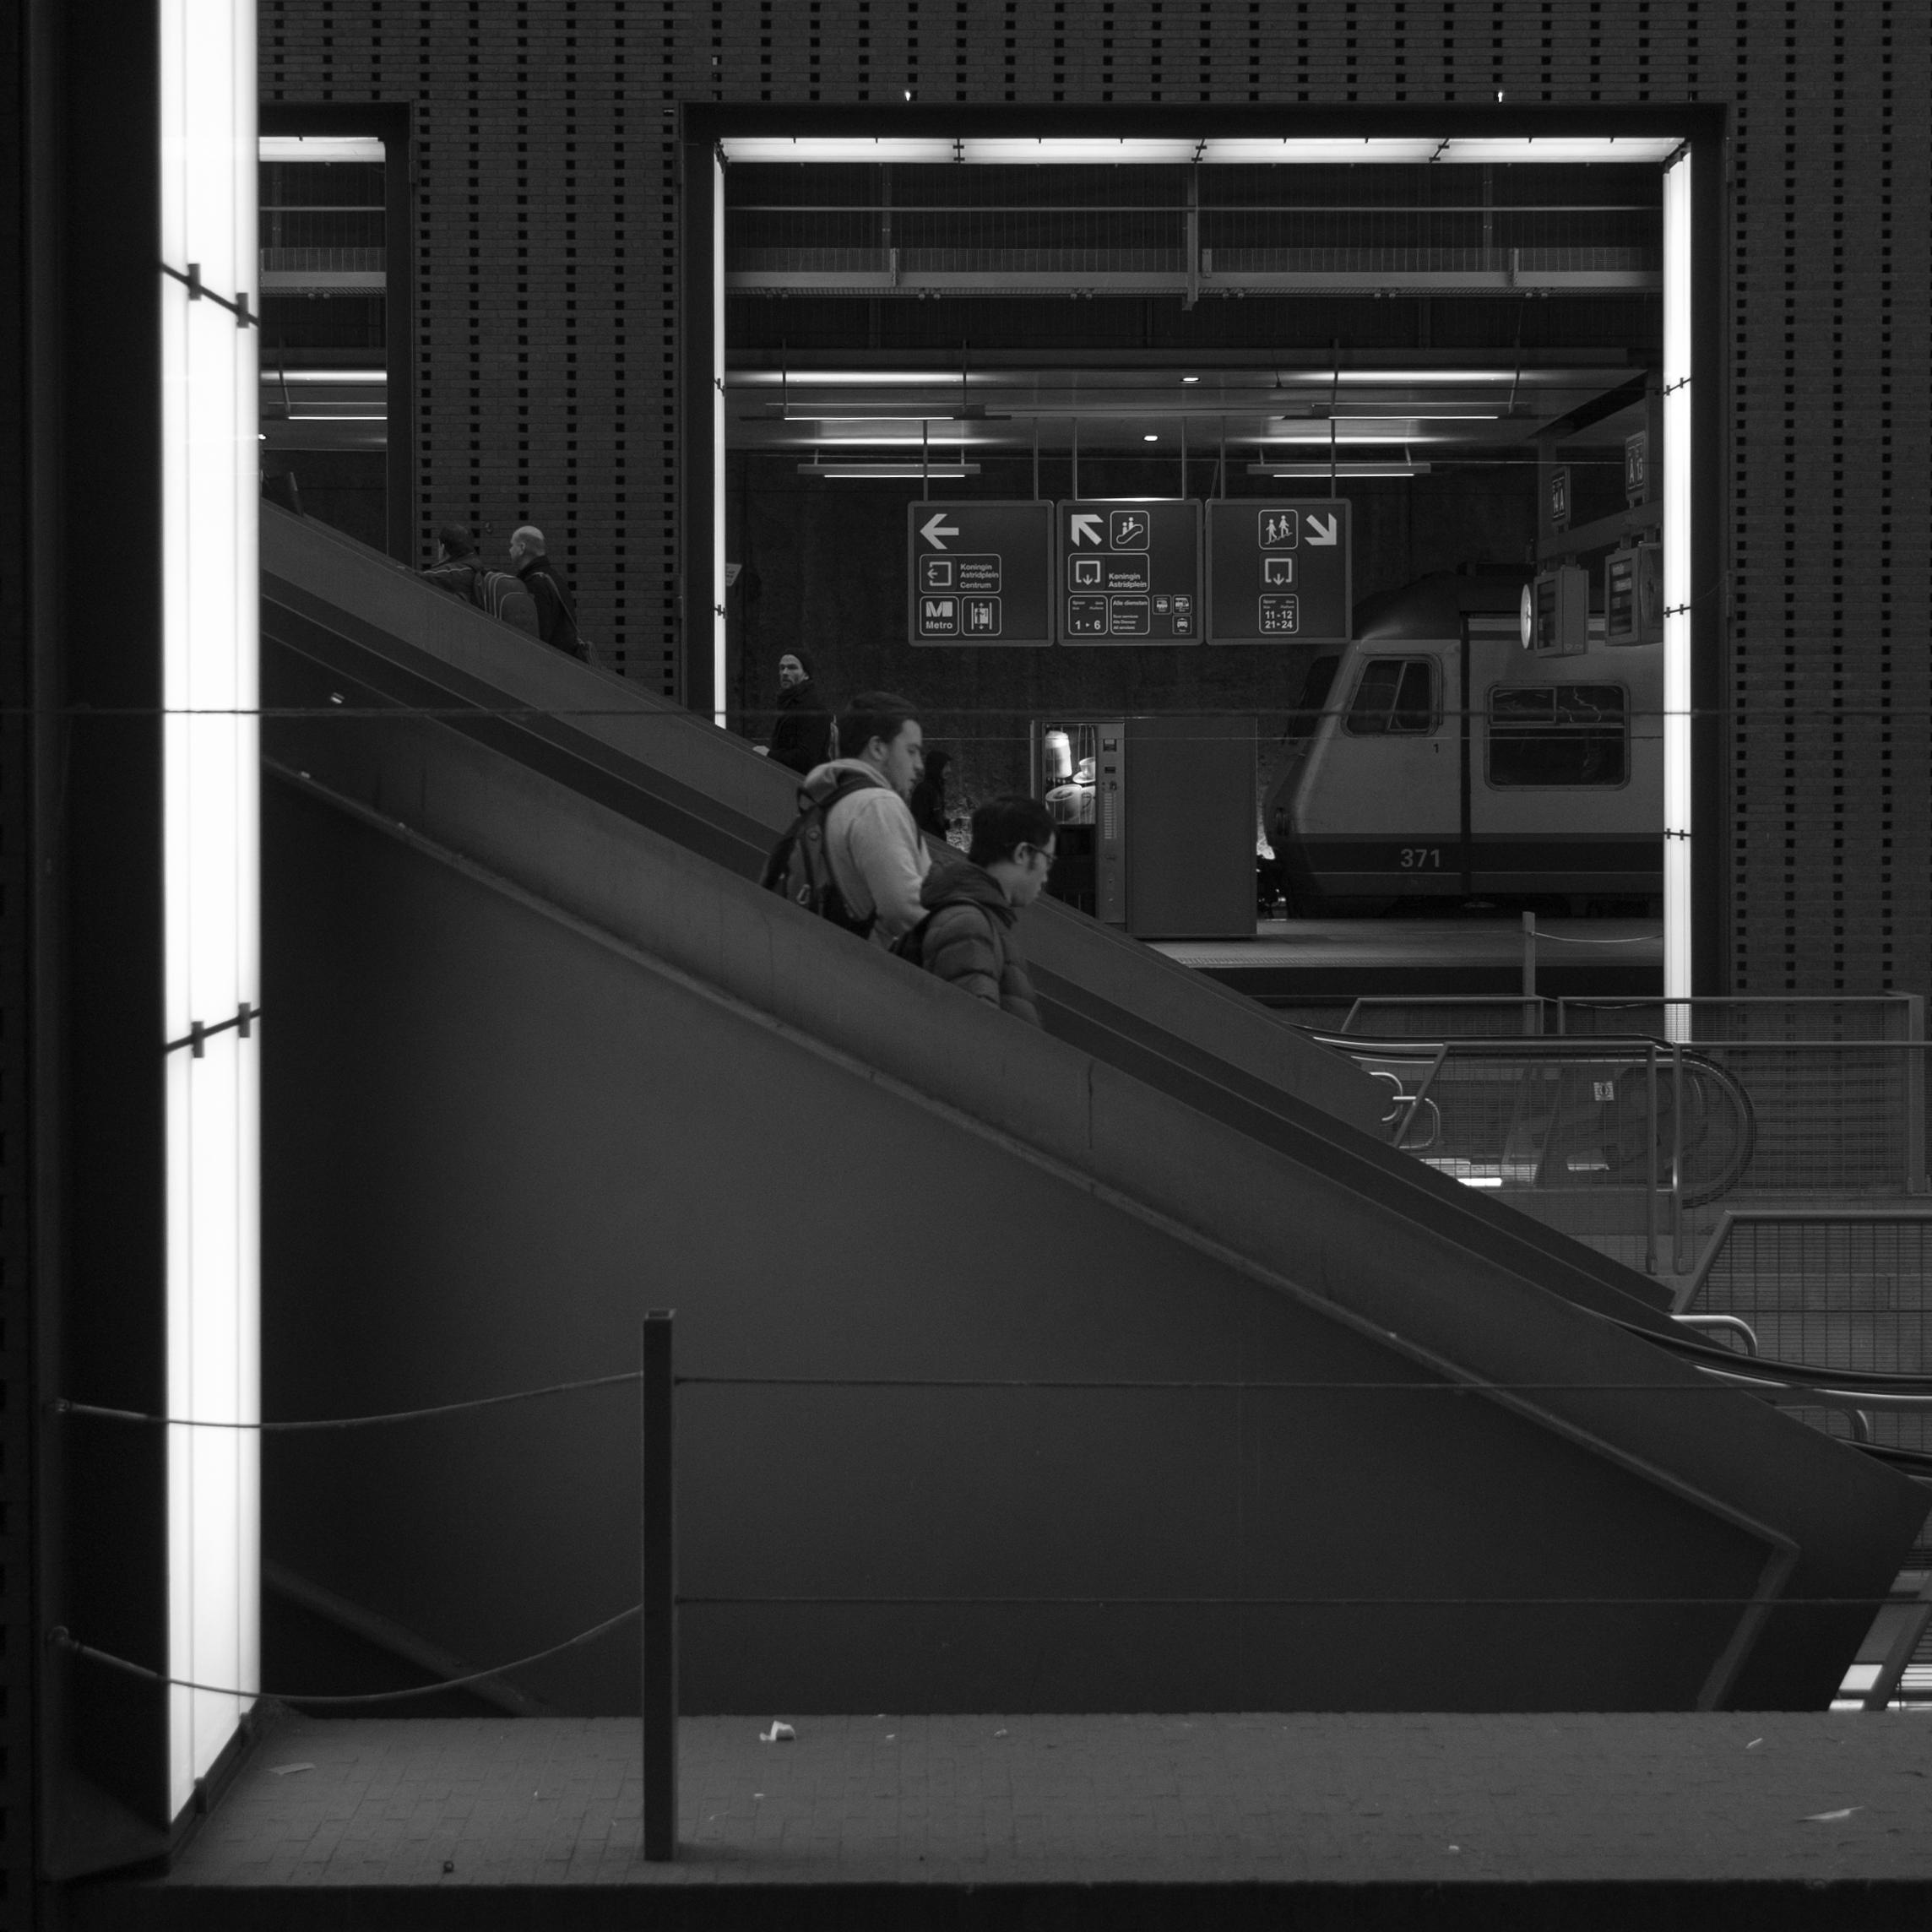 station atwerpen